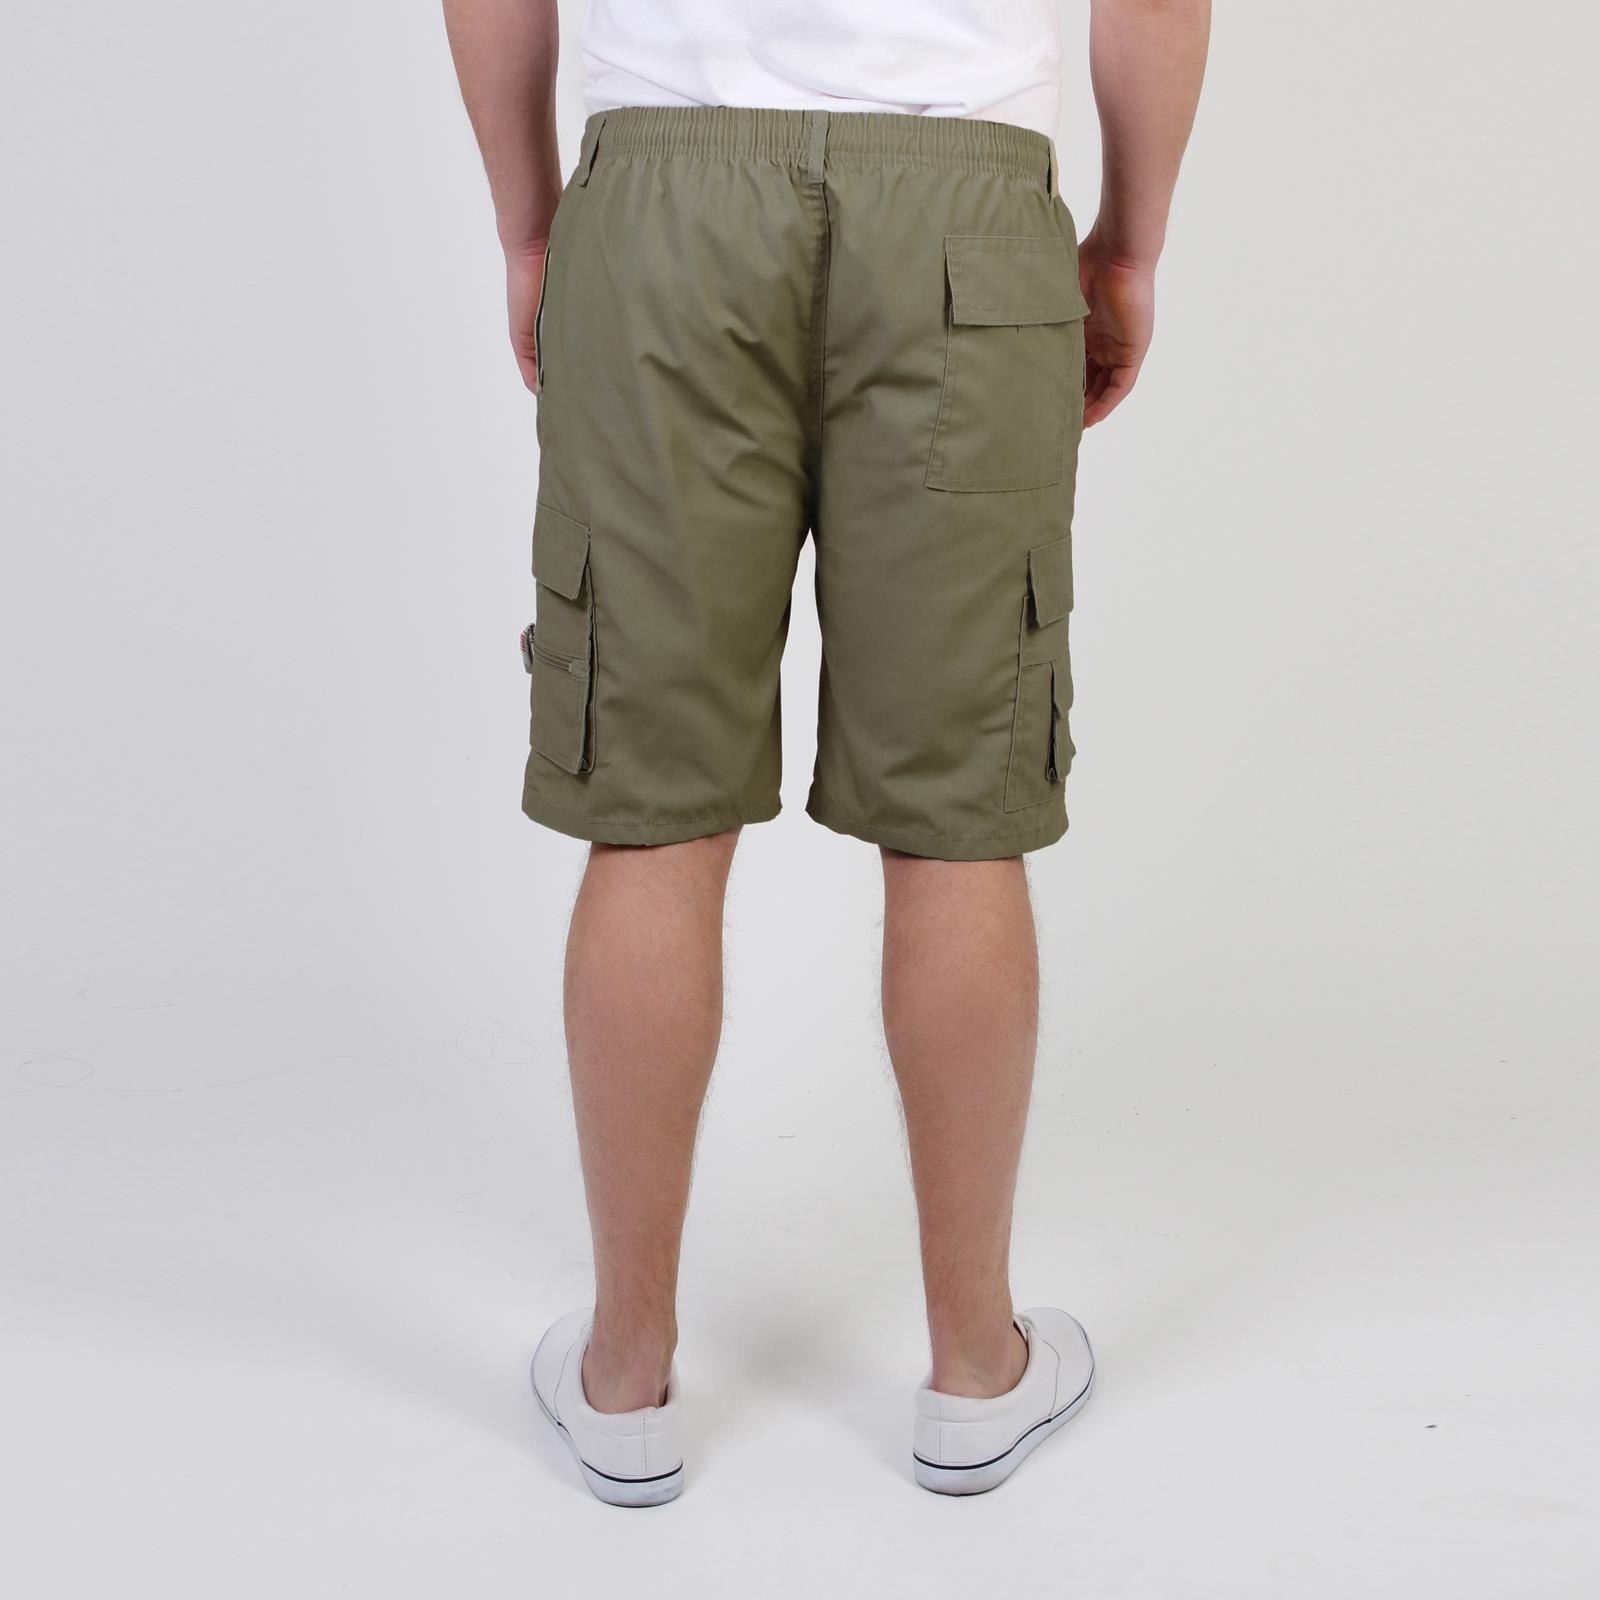 KRISP da Uomo Estivo in Cotone Pantaloncini Pantaloni Cargo Pants Camouflage